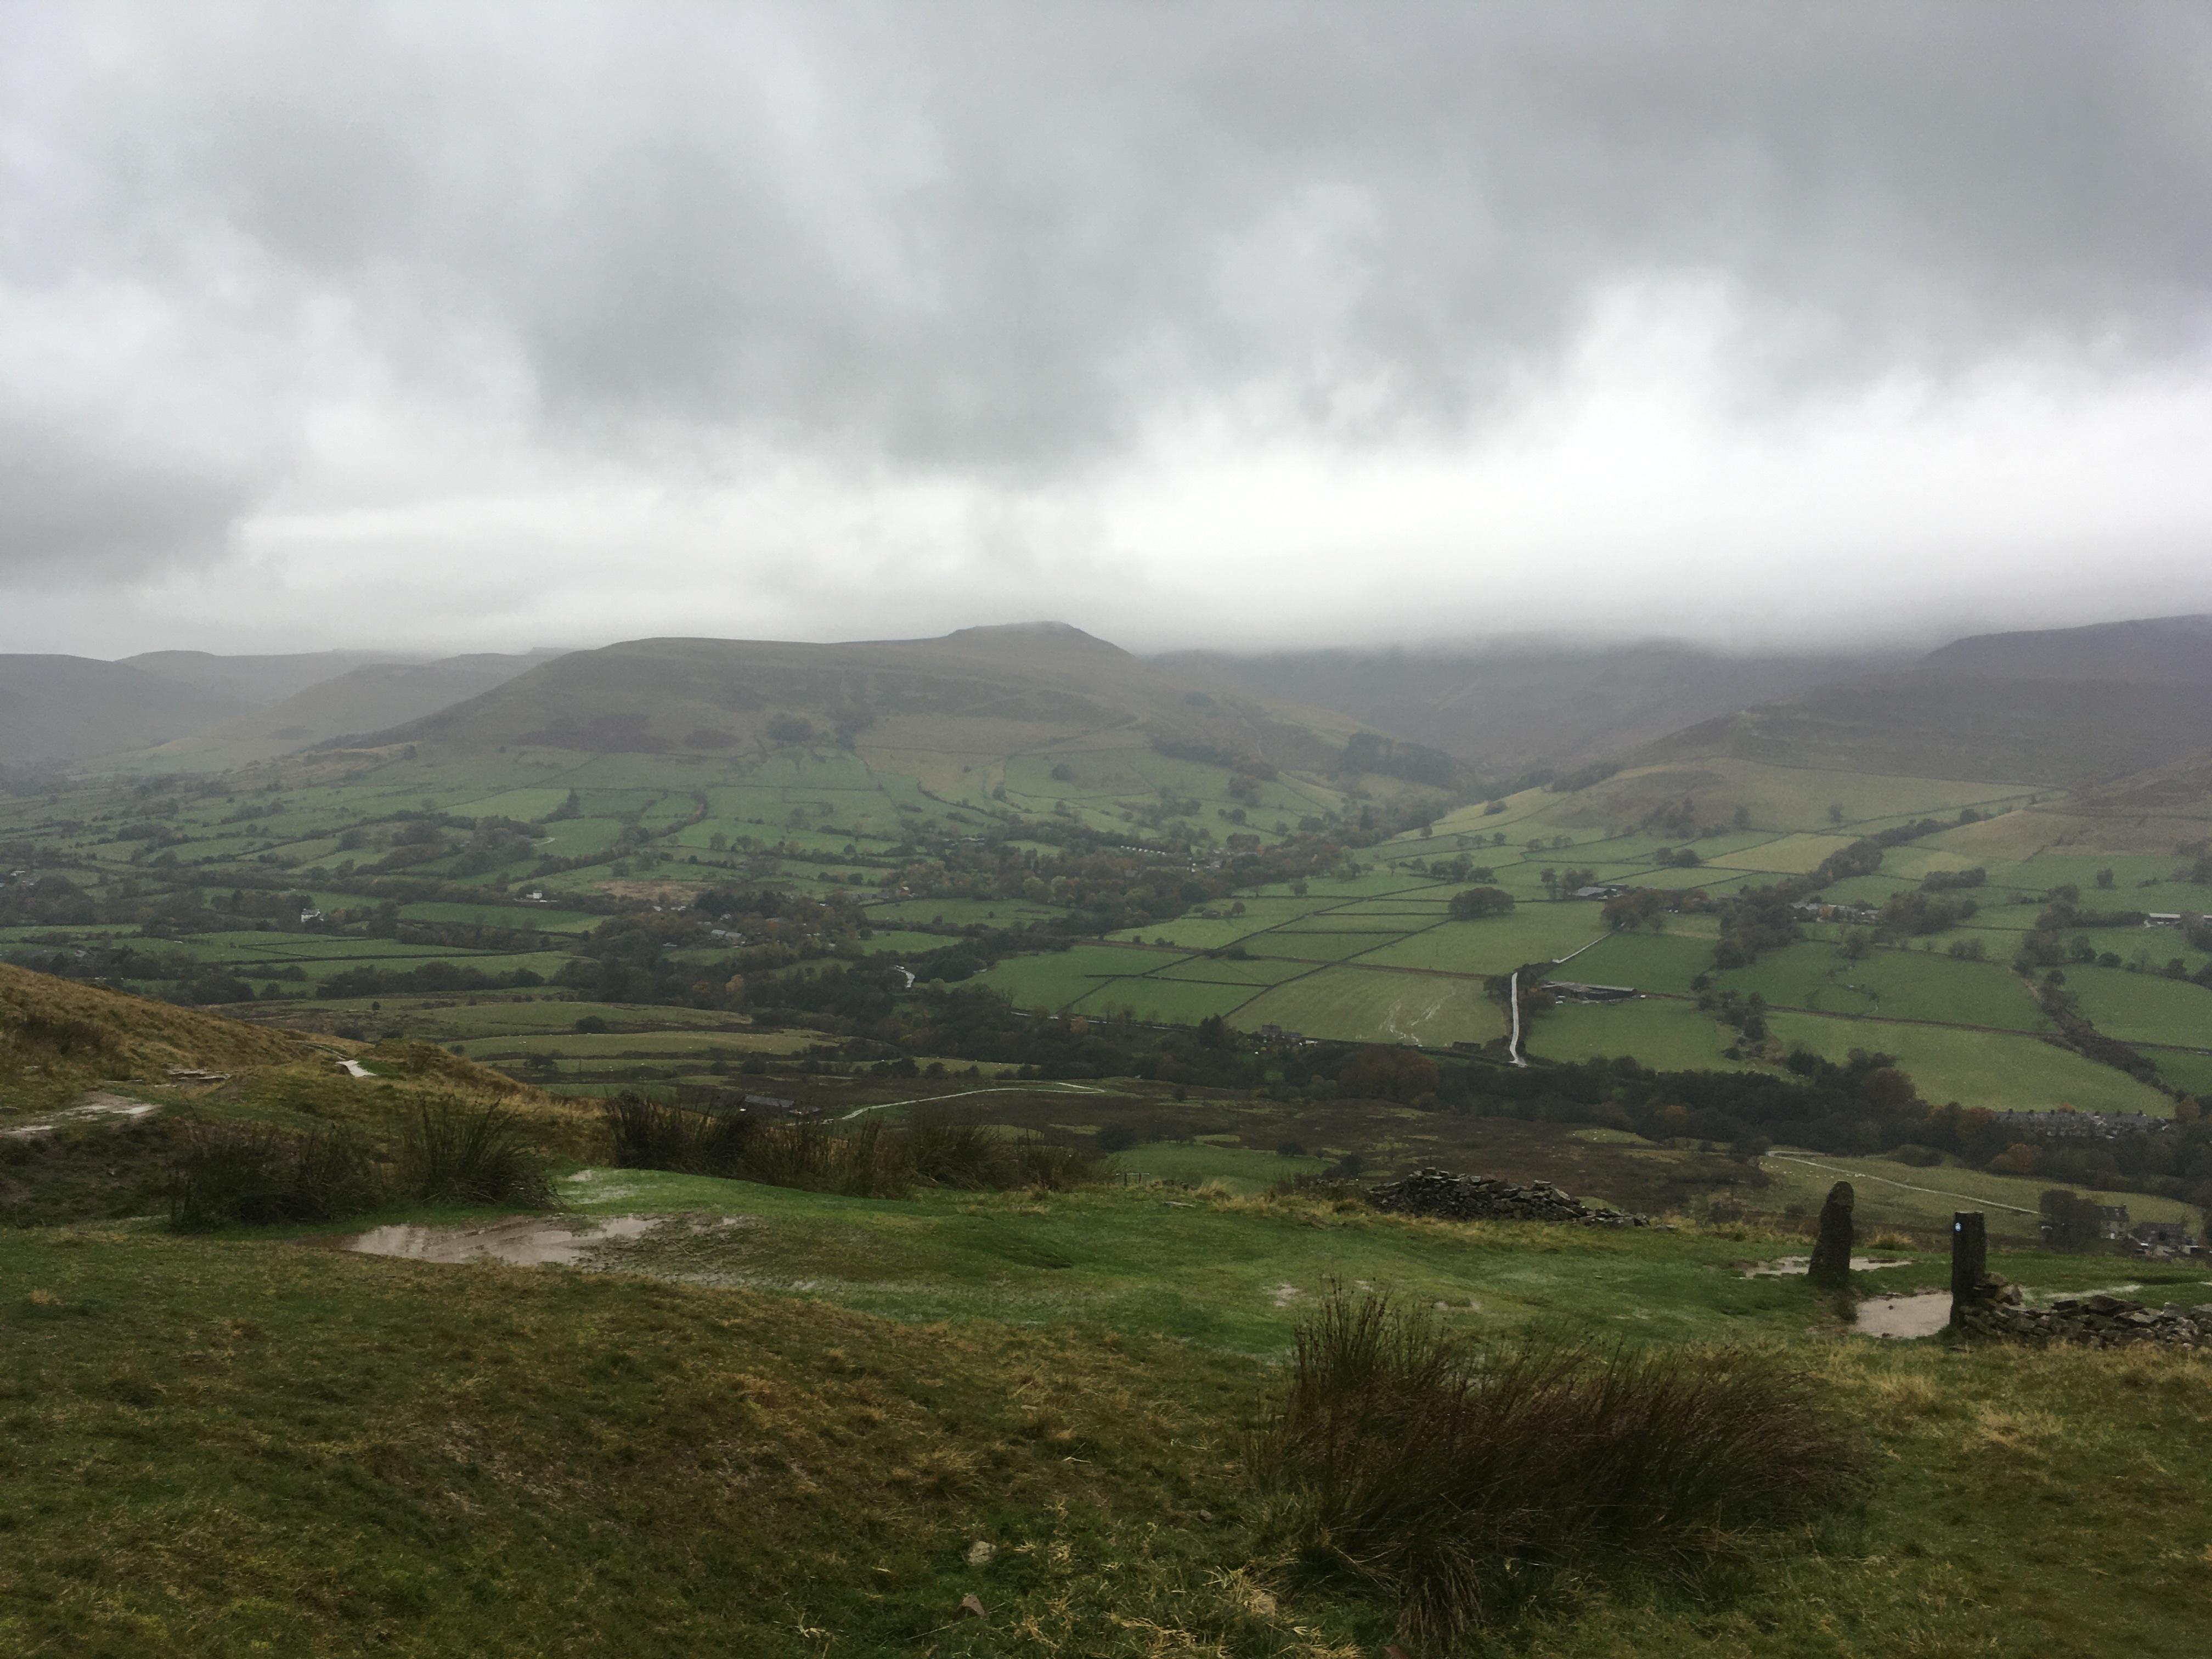 Walk, Derbyshire, walking, hiking, walking for wellbeing, wellbeing, mental health, rain, rainy day, weather, friends, Belper, aromatherapy, massage, health, dogs, dog walking, Mam Tor, Peak District